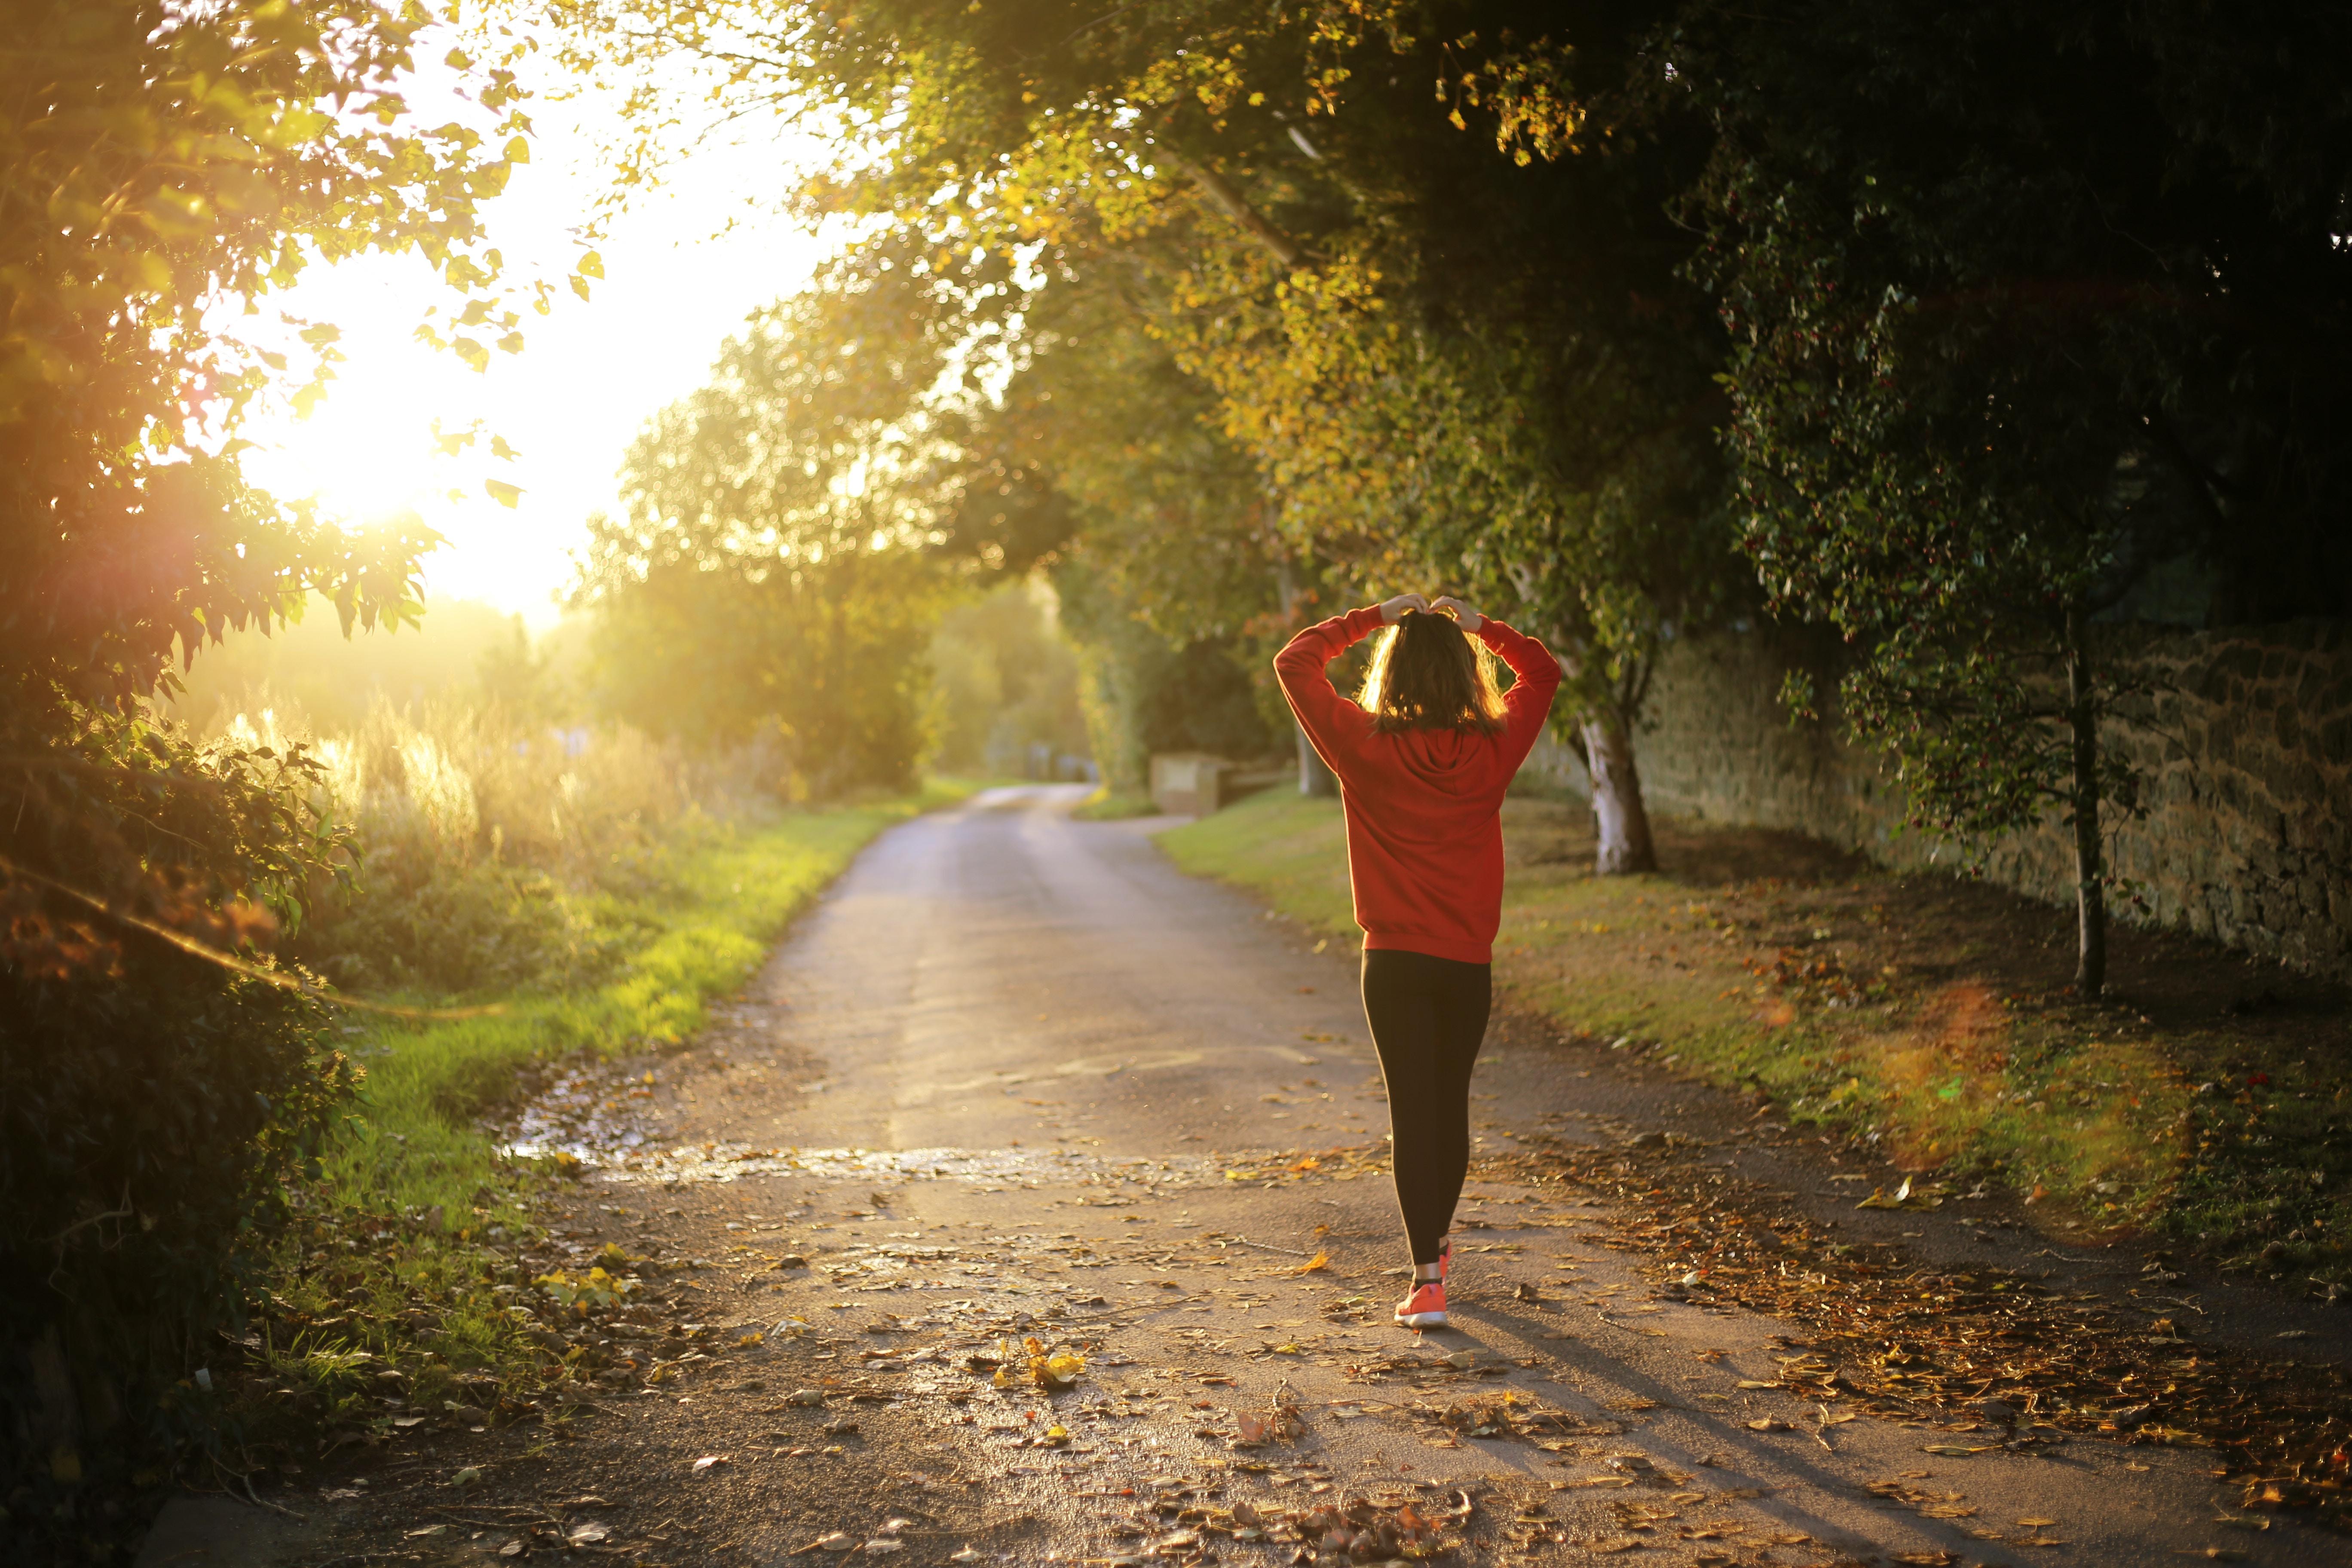 burnout syndrome ภาวะหมดไฟ หมดไฟทำงาน เบื่องาน ทำไงดี